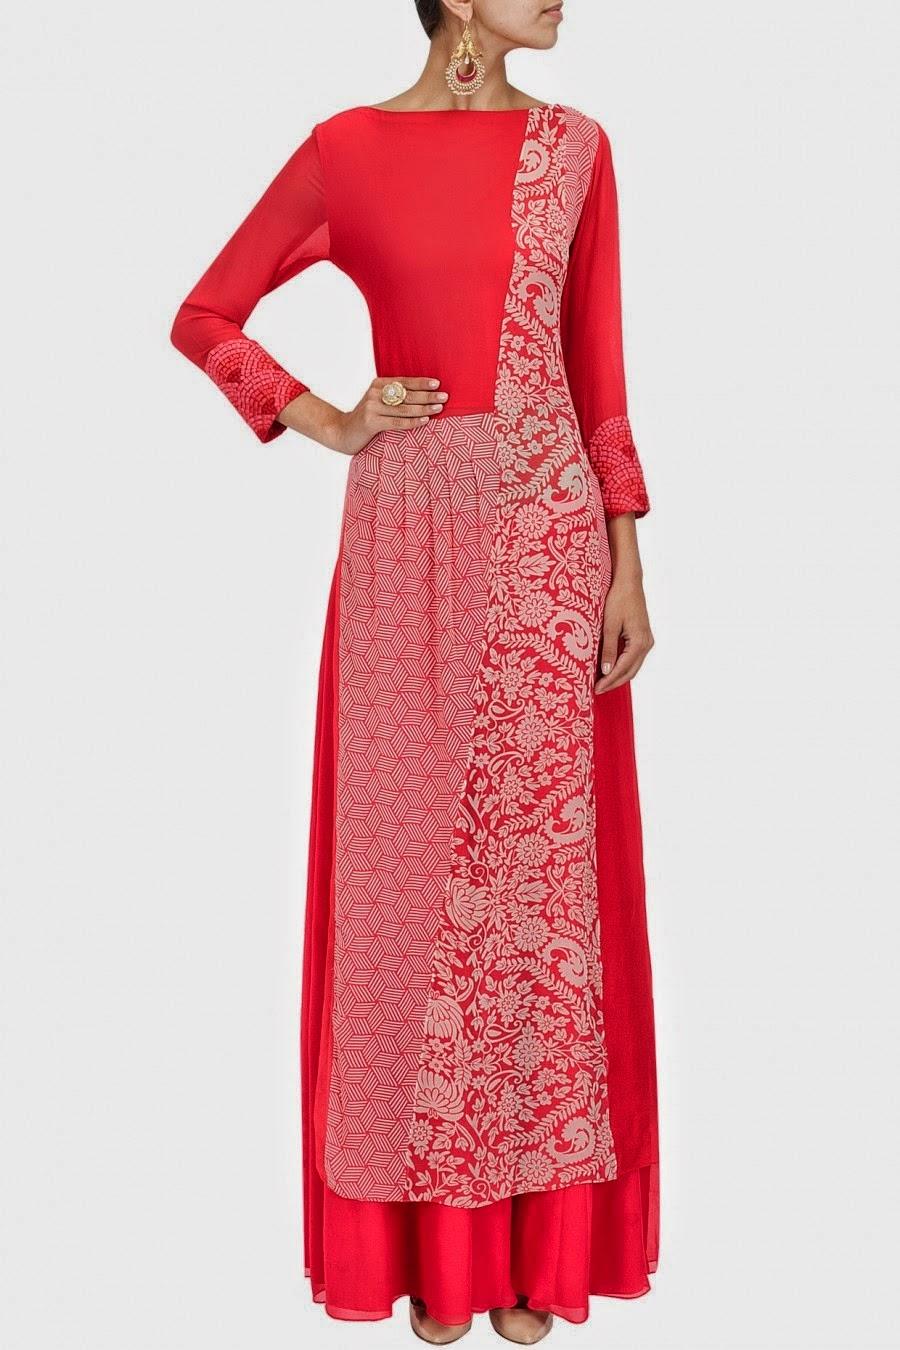 manish malhotra designer fancy elegant best wedding wear